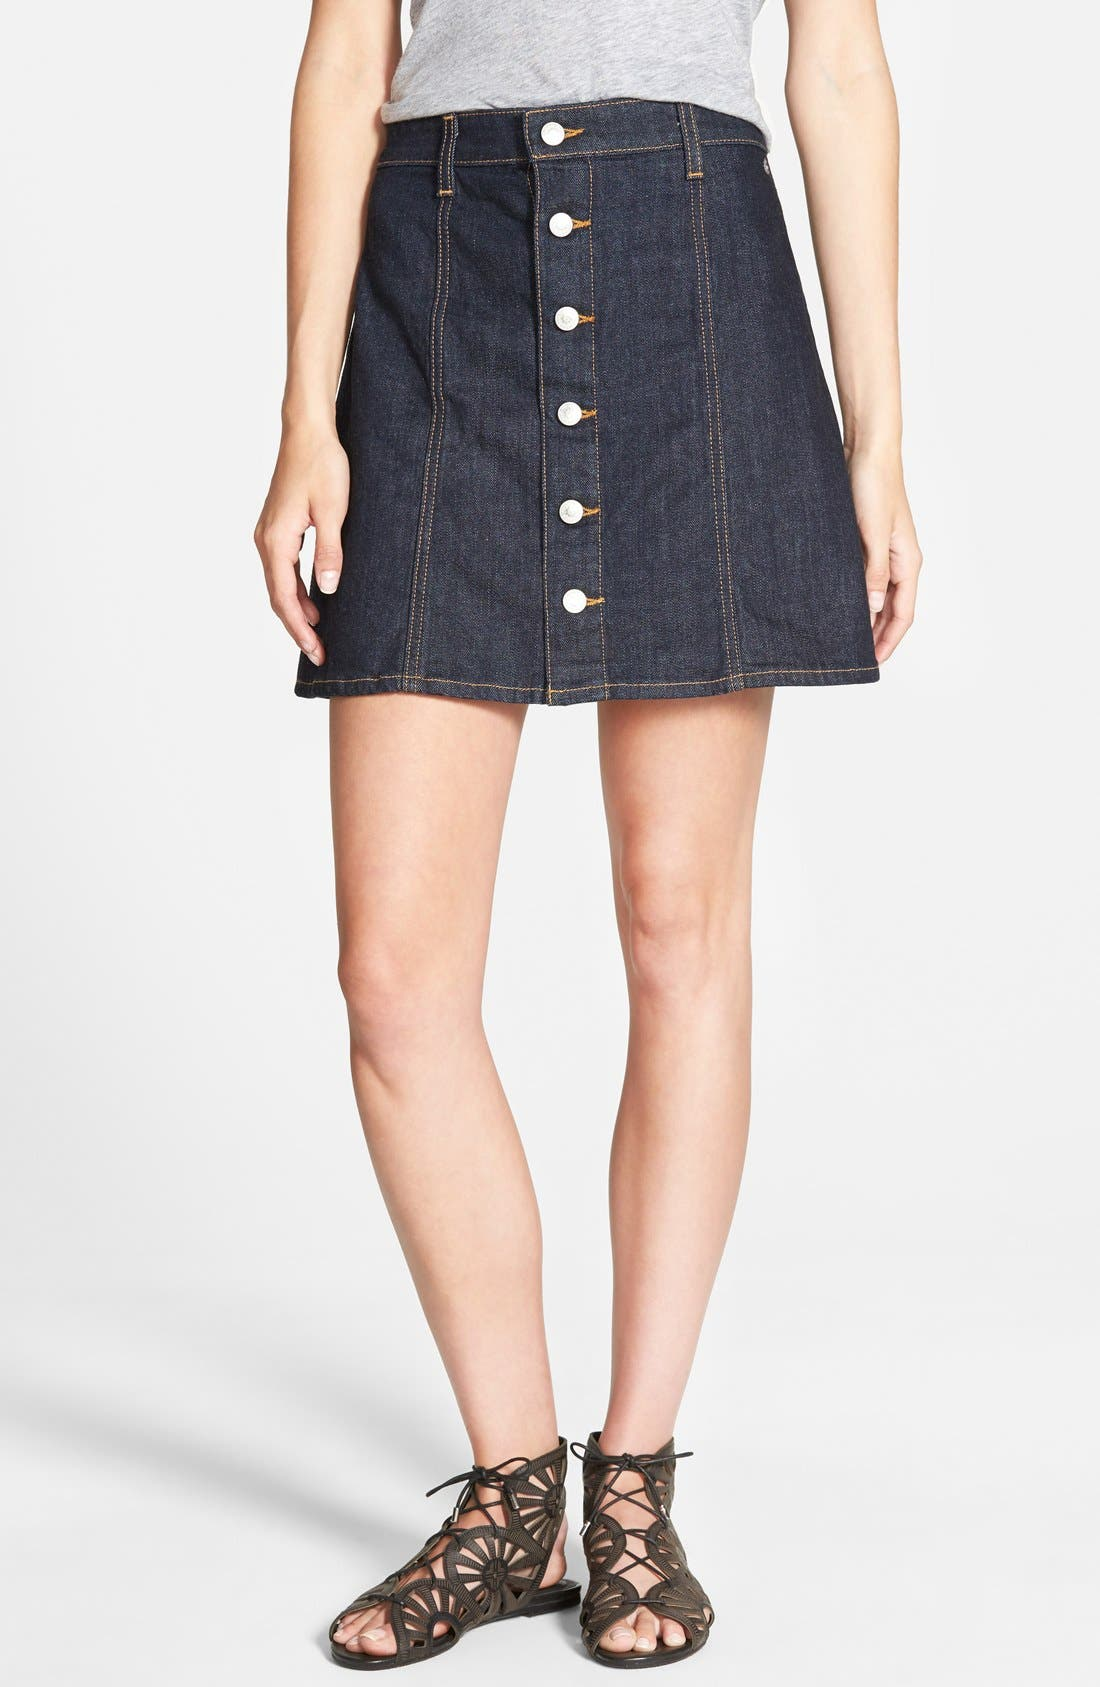 Alternate Image 1 Selected - Alexa Chung for AG 'The Kety' A-Line Denim Skirt (Loan Star)